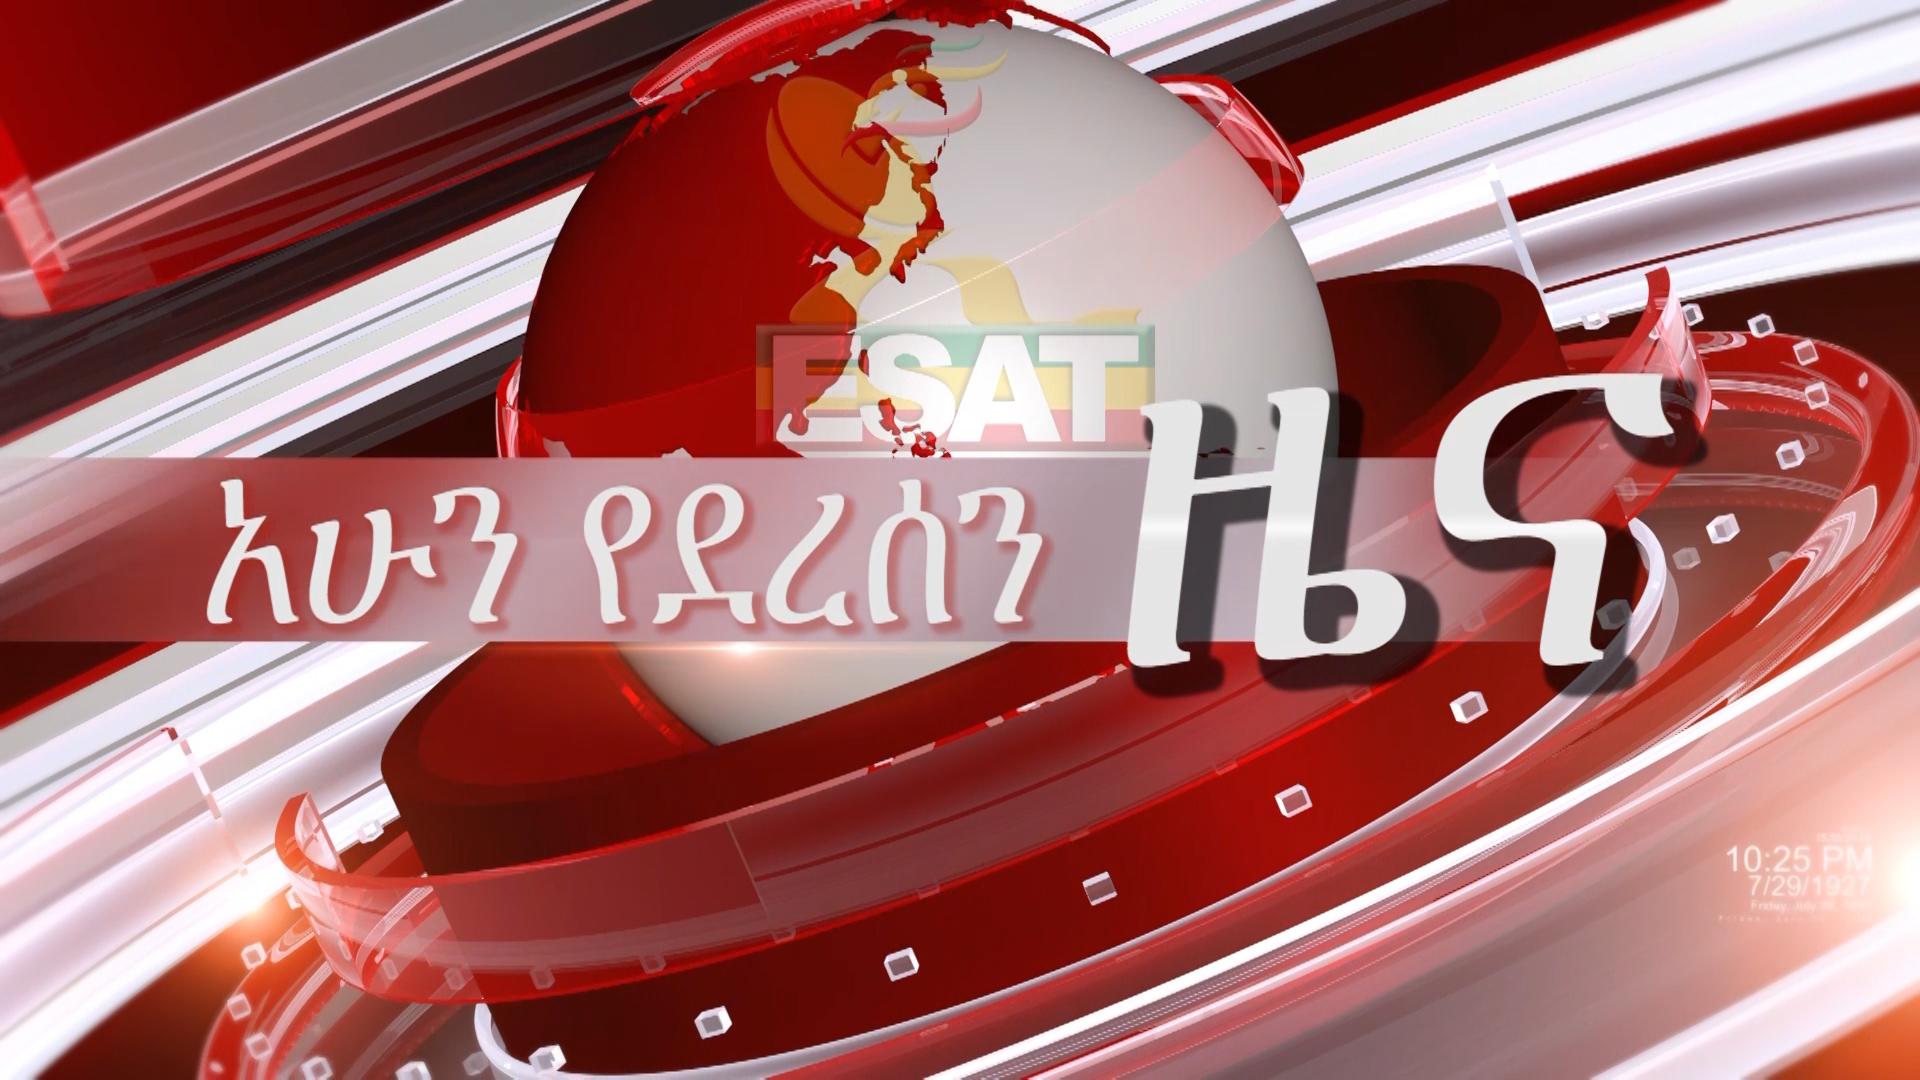 Esat Update News Bahridar Nov 01 2016 The Ethiopian